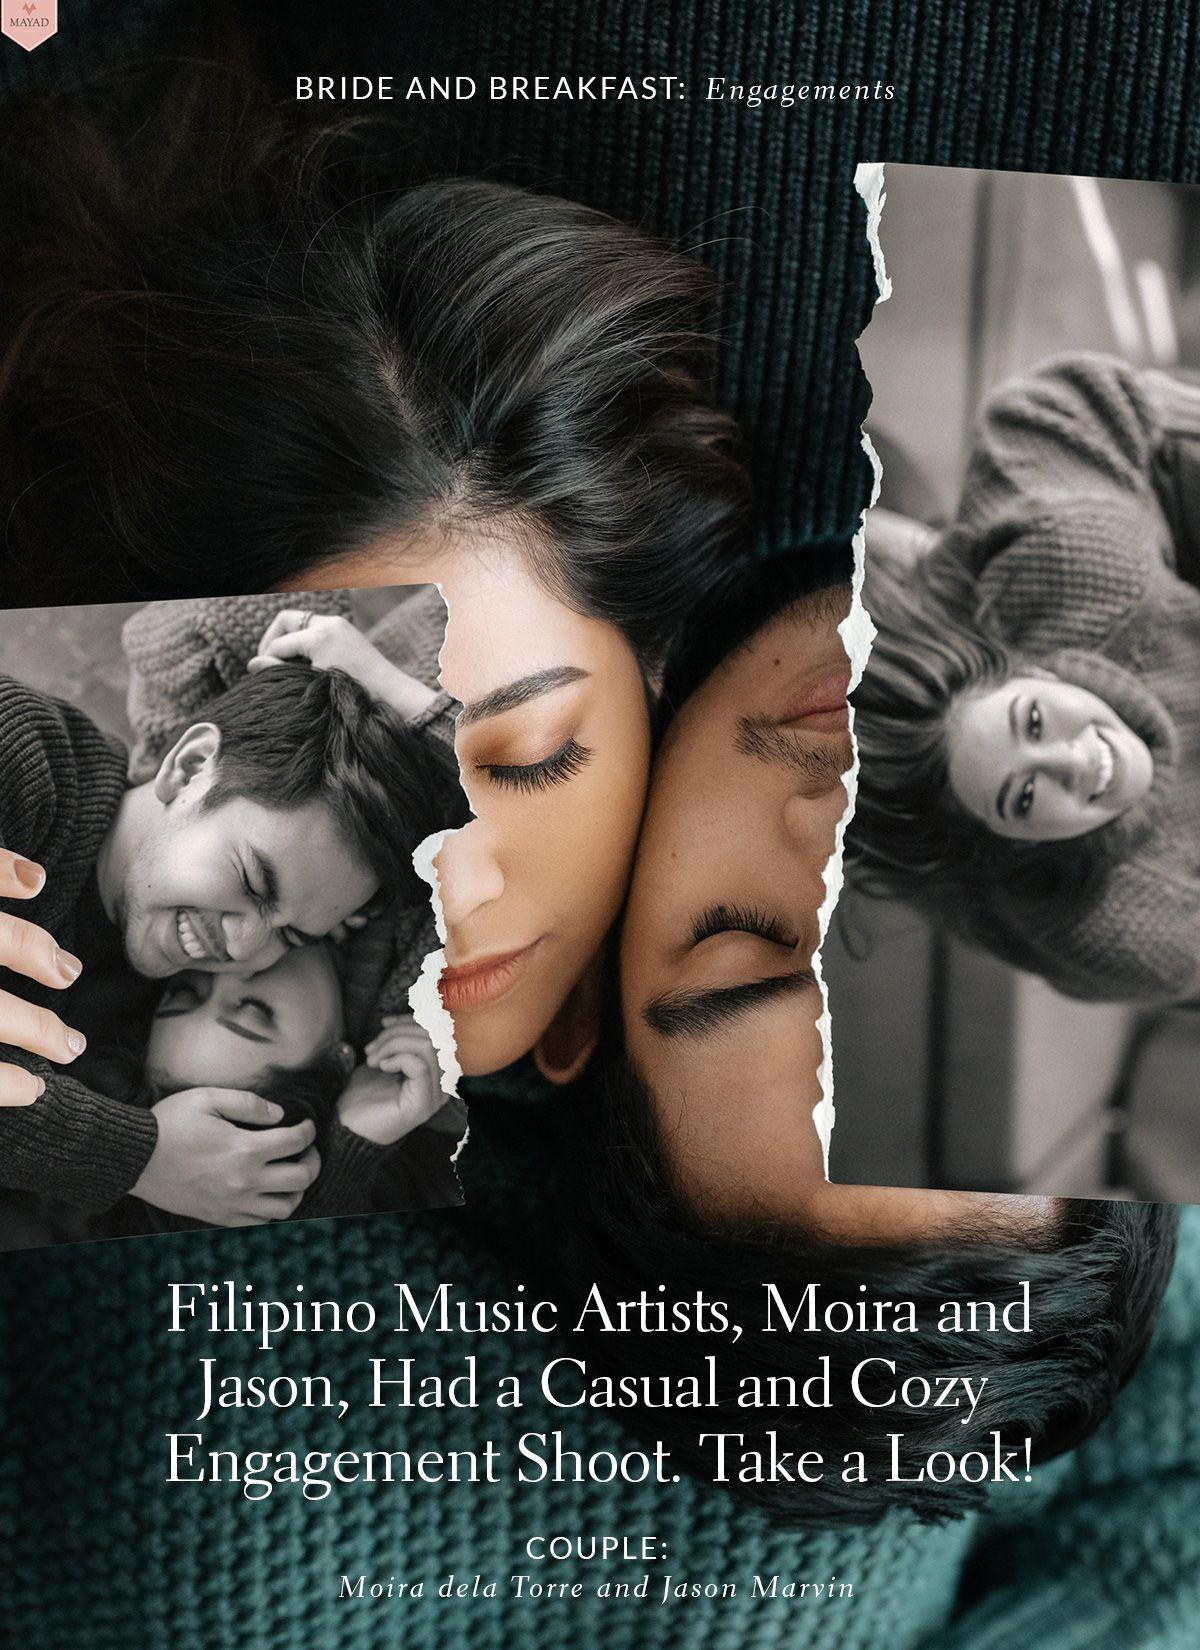 Filipino Music Artists, Moira and Jason, Had a Casual and